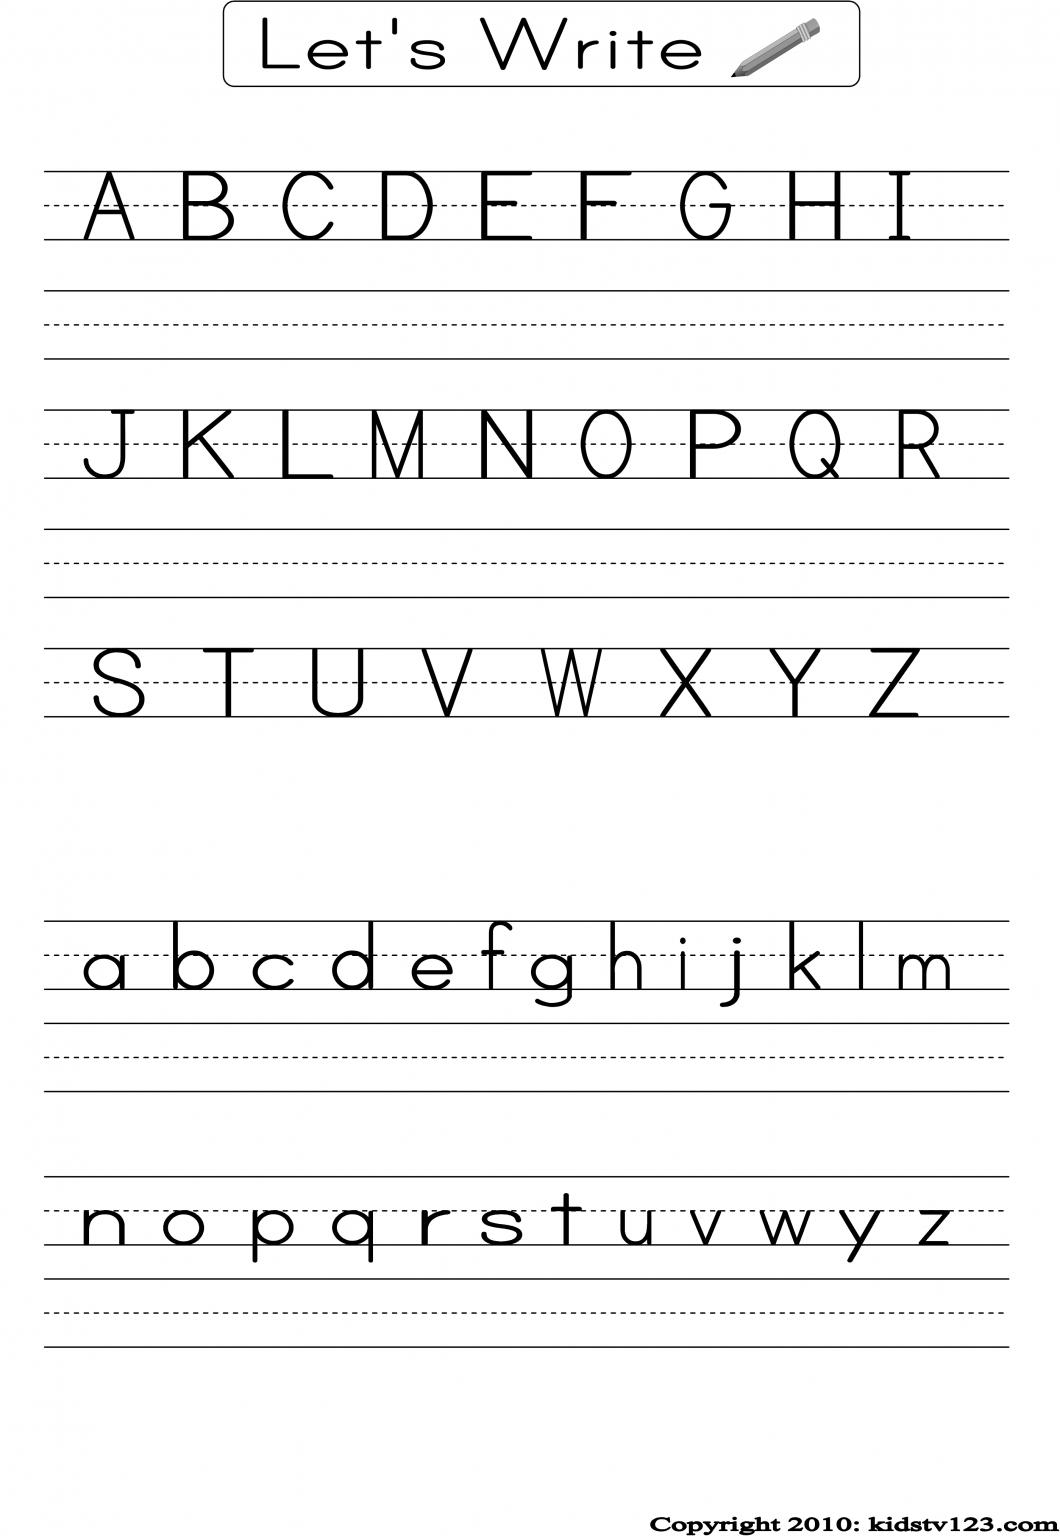 Pre K Writing Worksheets – With Free Printables Also Printable | Printable Handwriting Worksheets For Kindergarten